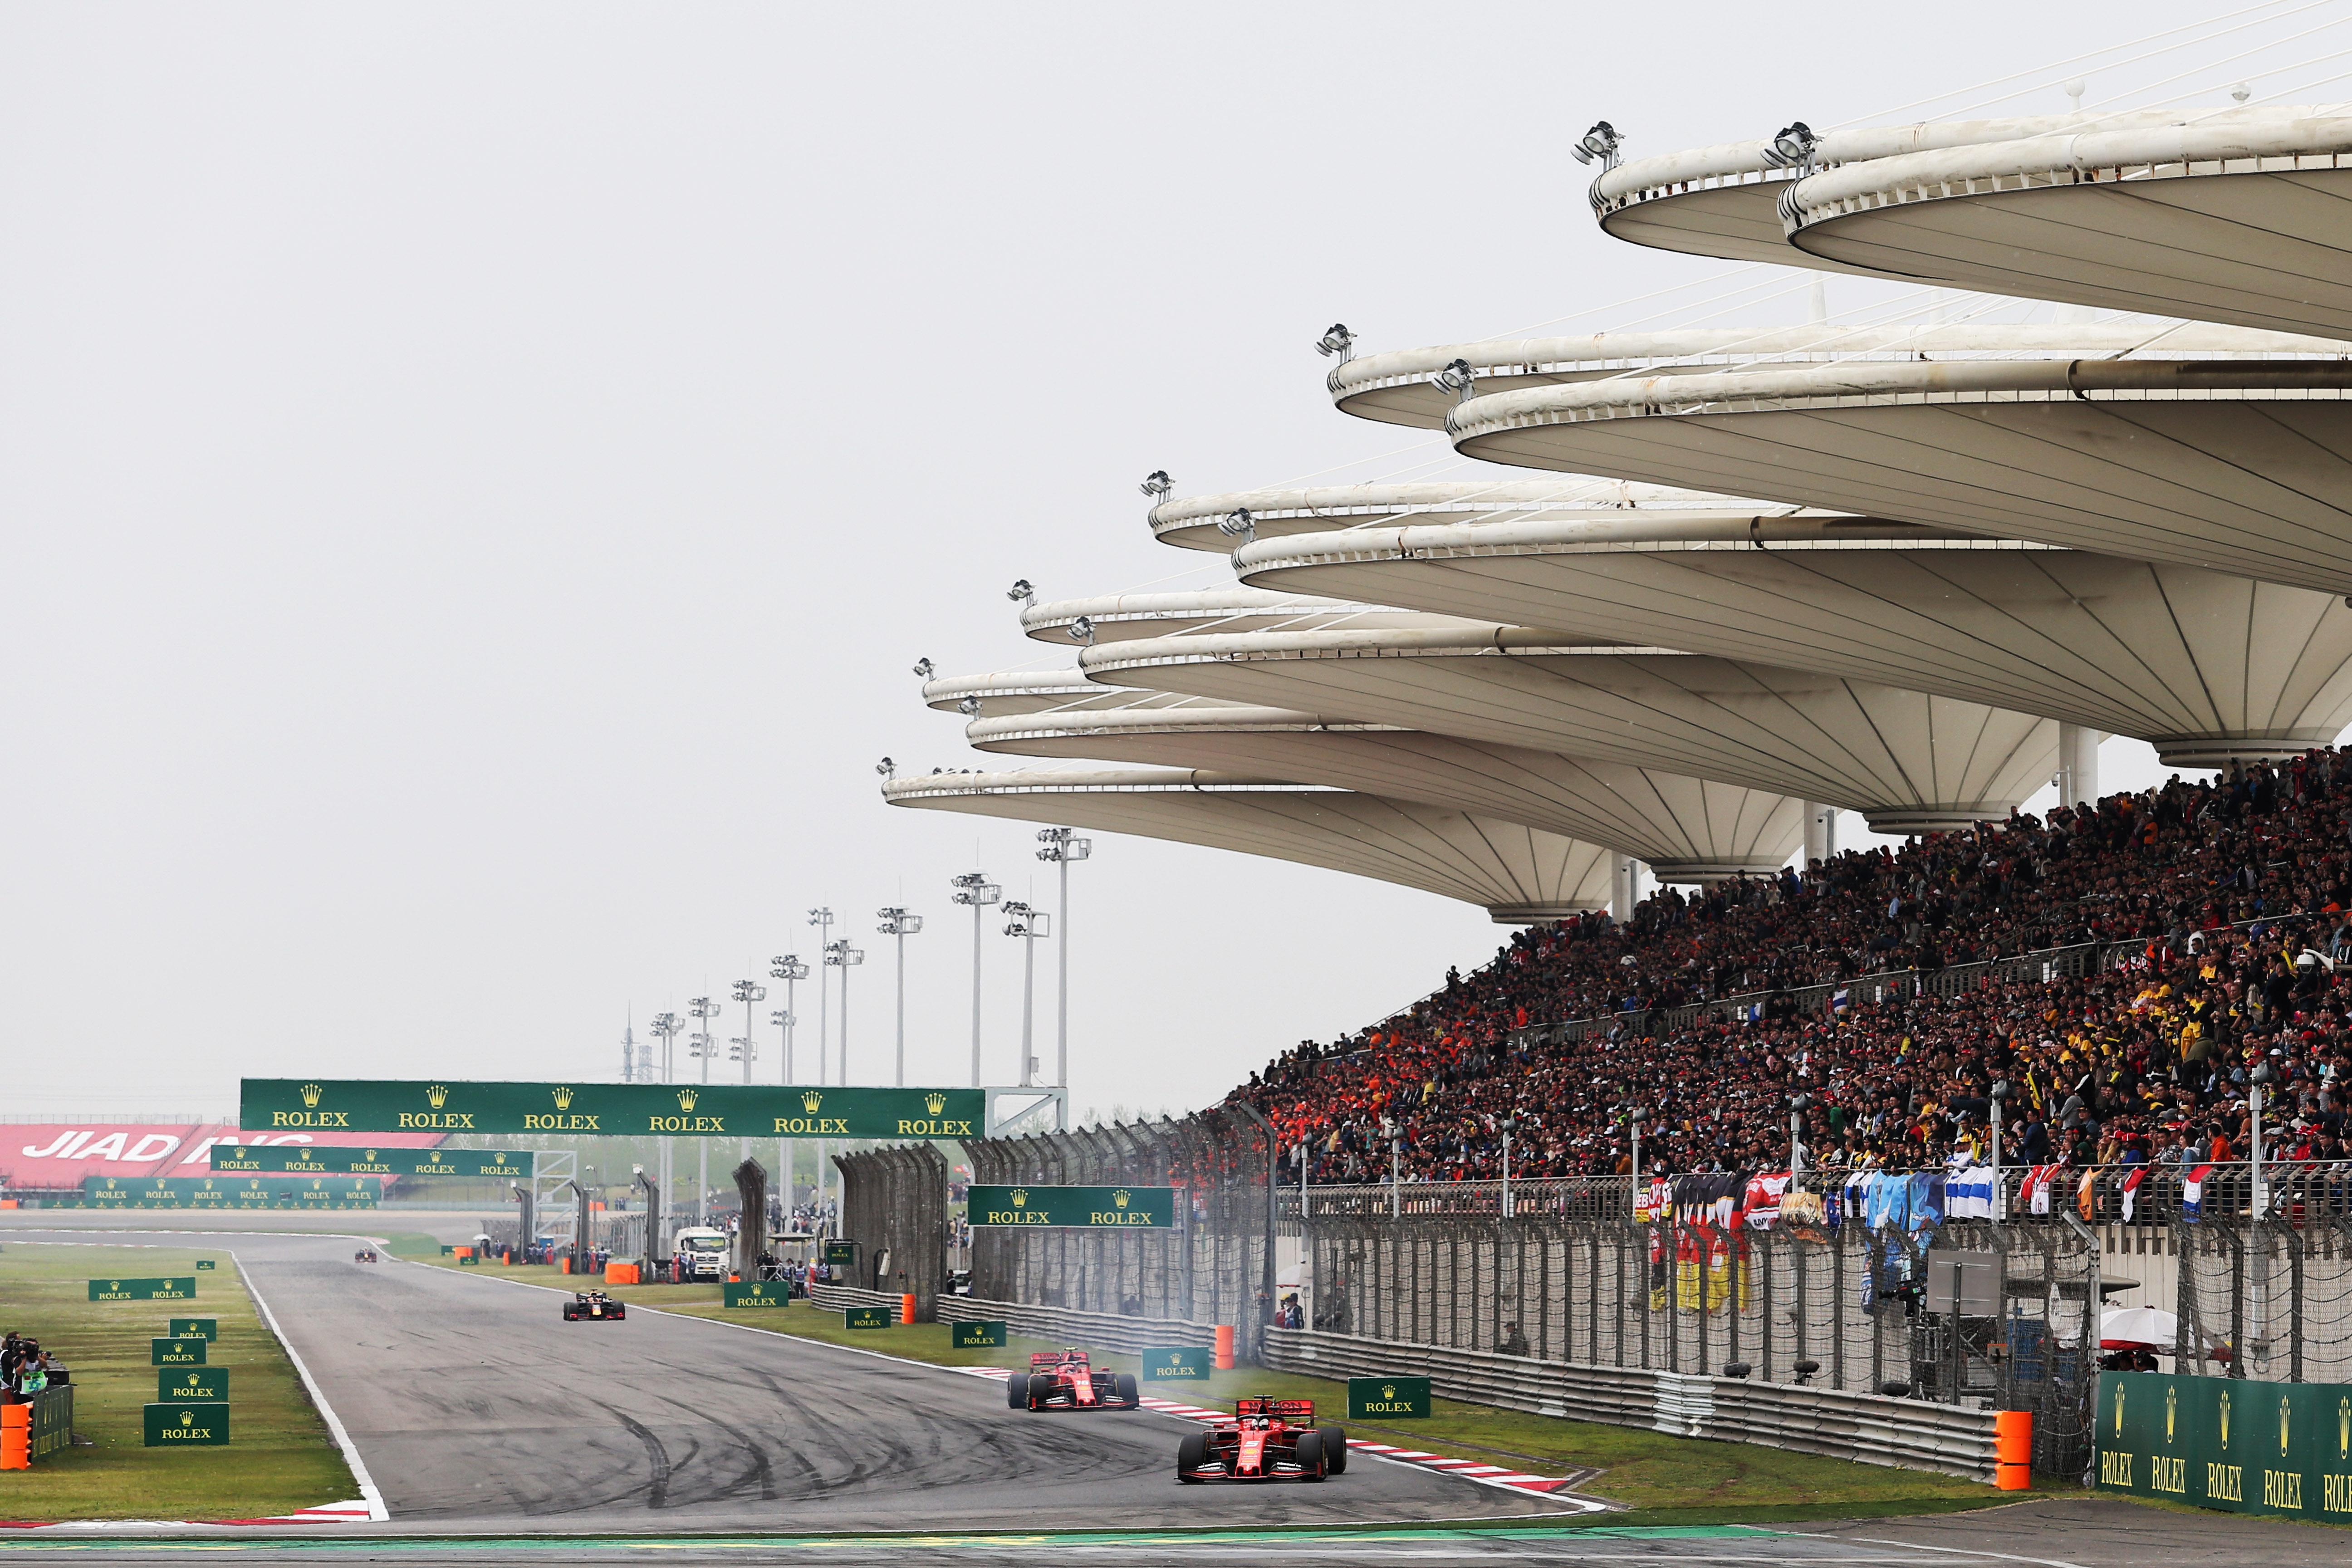 Motor Racing Formula One World Championship Chinese Grand Prix Race Day Shanghai, China